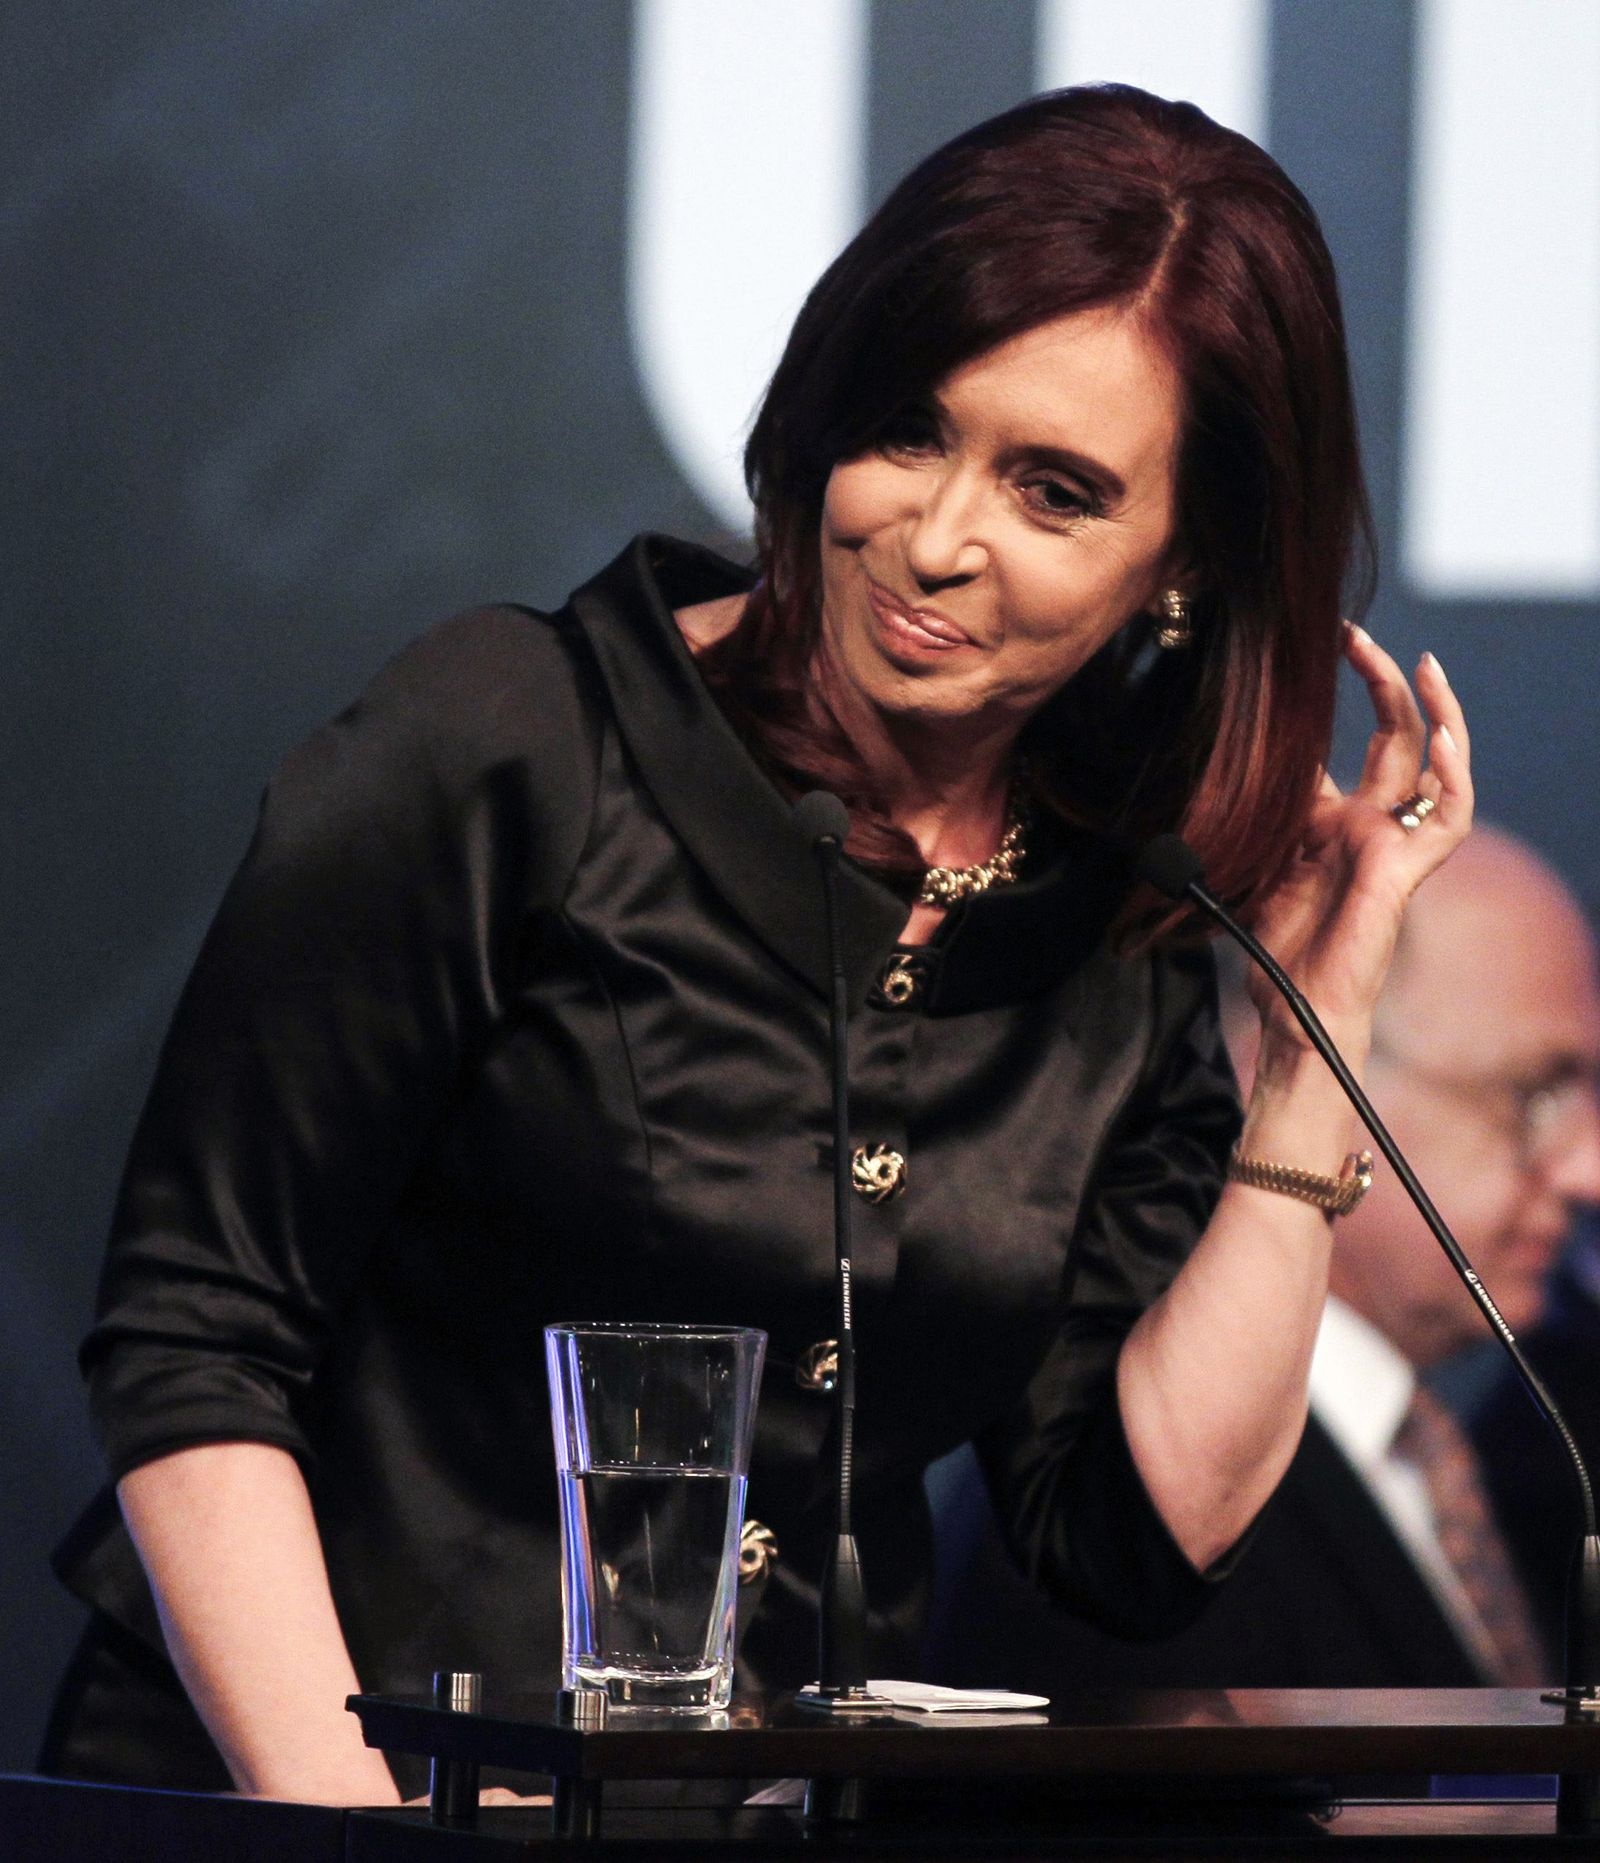 Argentinien Cristina Fernandez de Kirchner